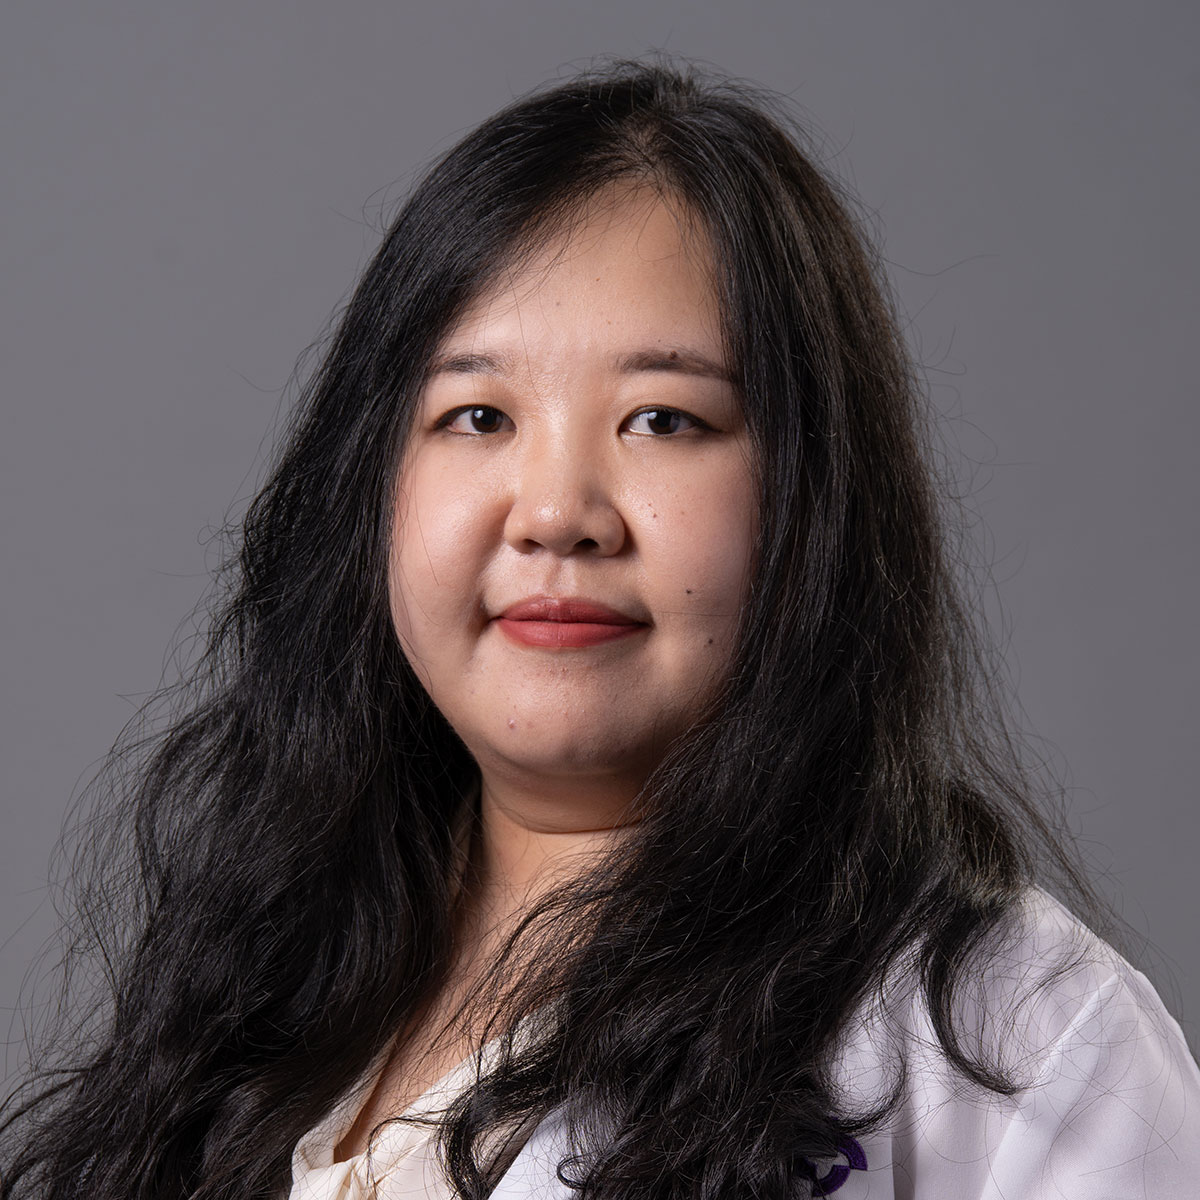 A friendly headshot of Dr. Jiaqi Mi